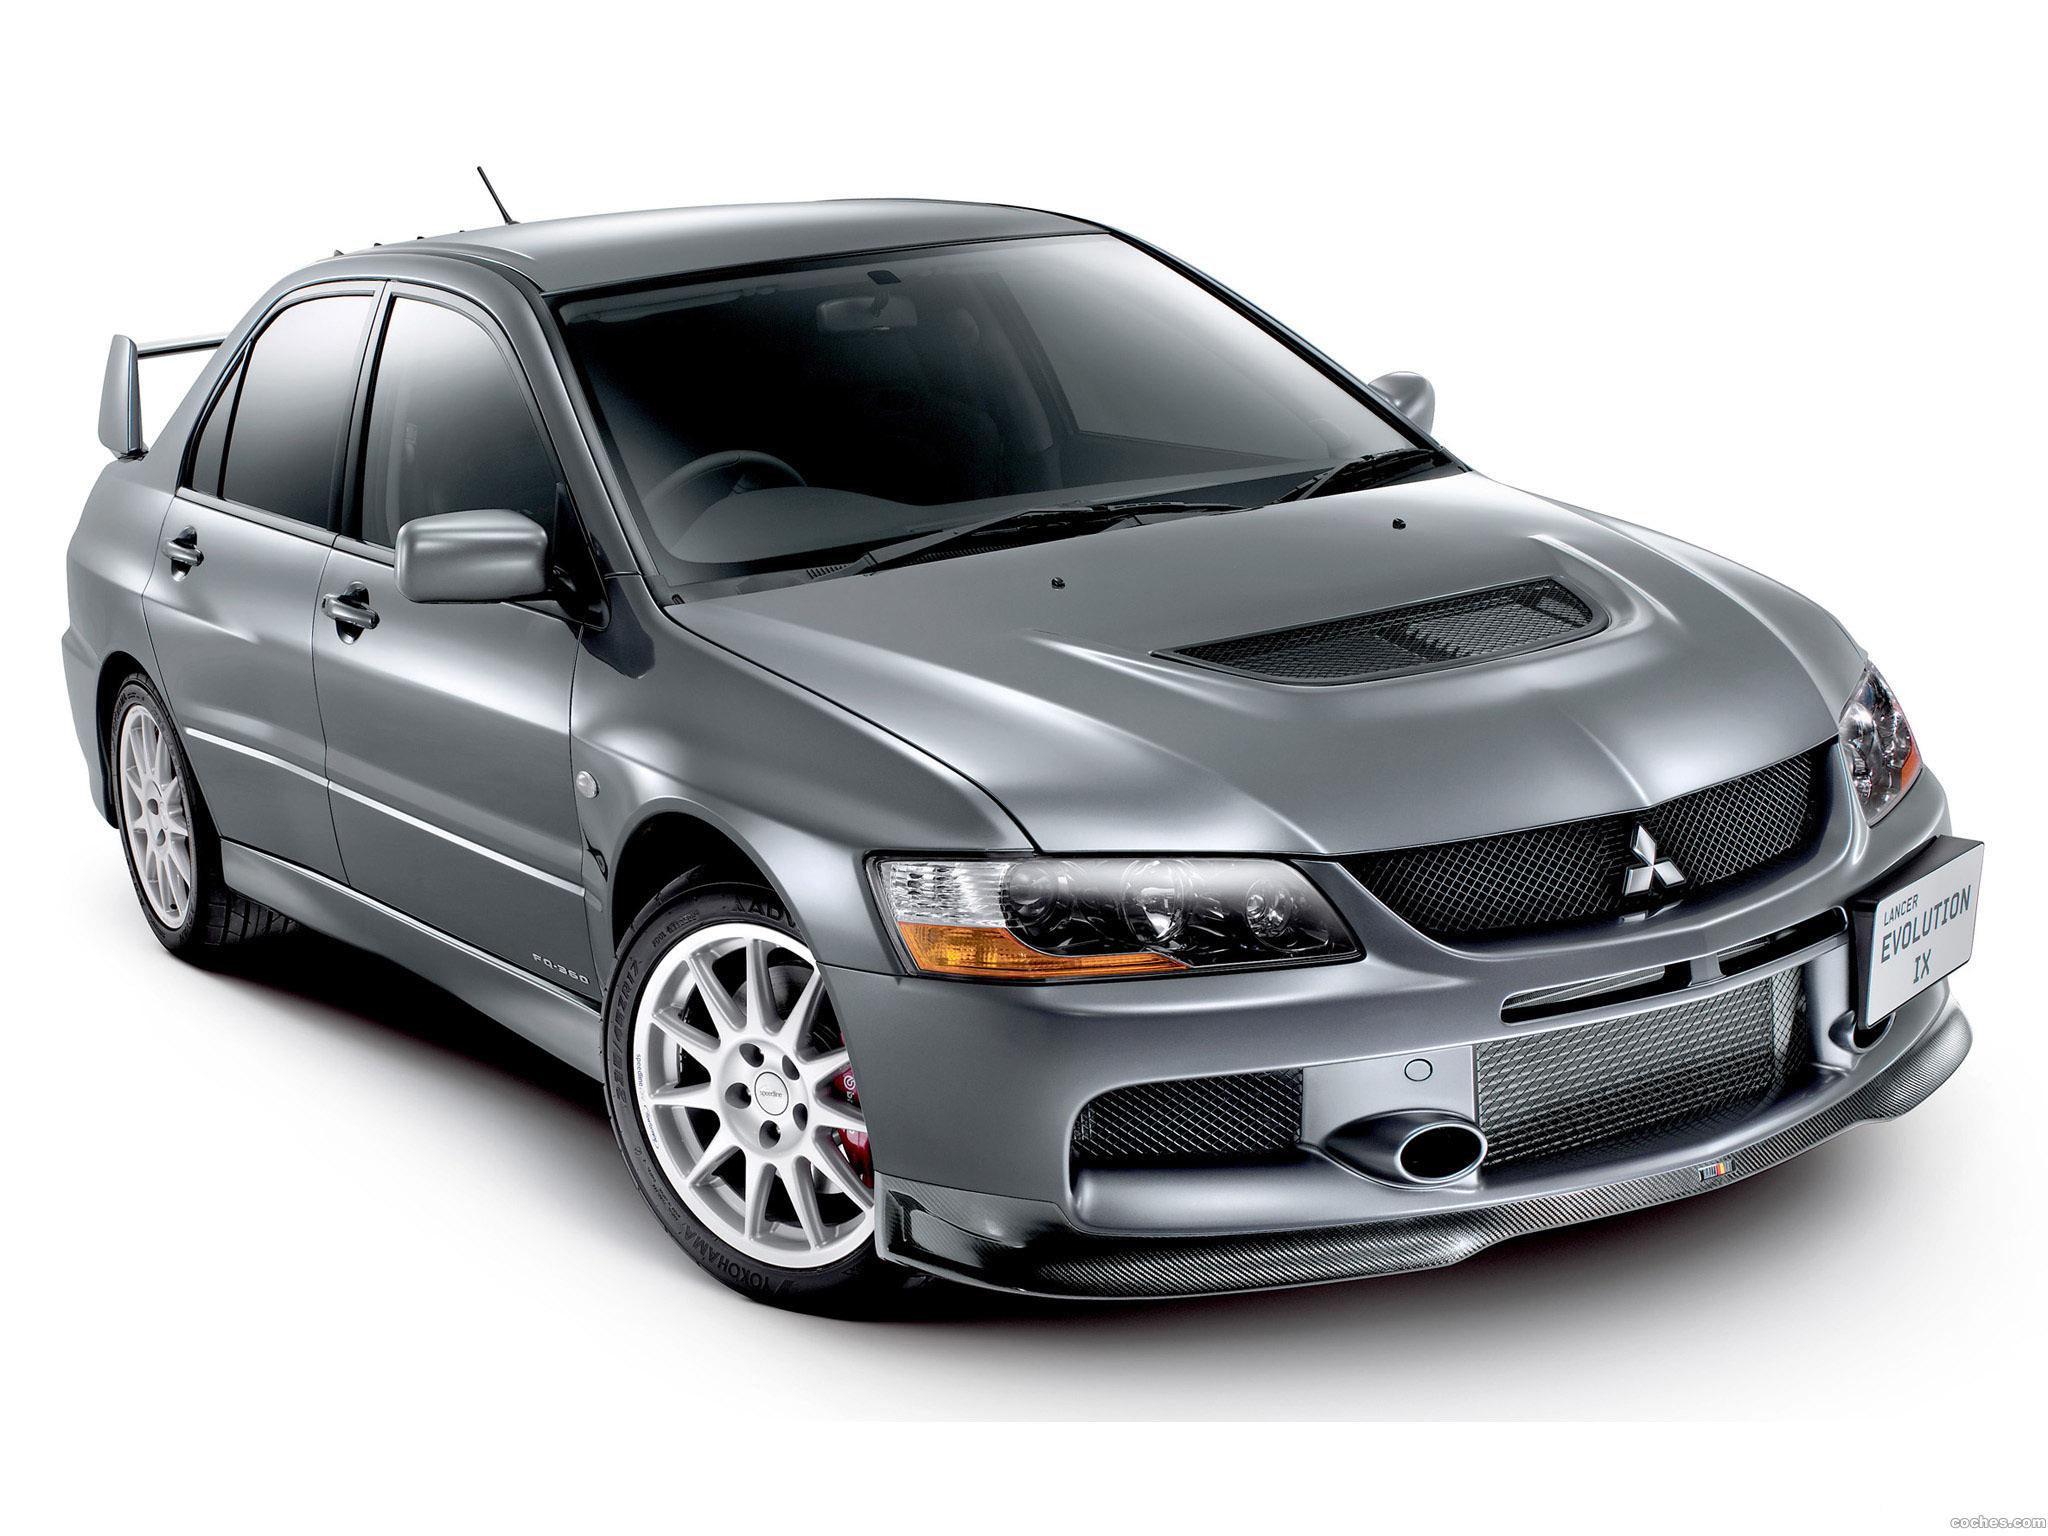 Foto 4 de Mitsubishi Lancer Evolution IX MR FQ 360 Final Edition 2007